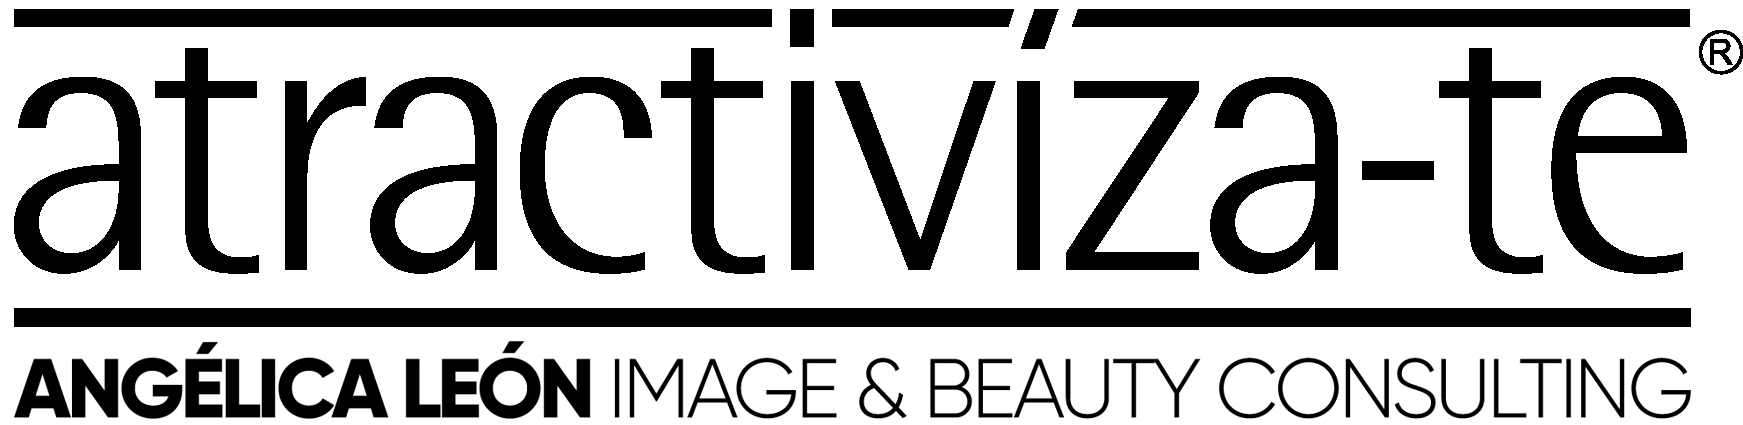 logo-atractivizate-con-slogan-black